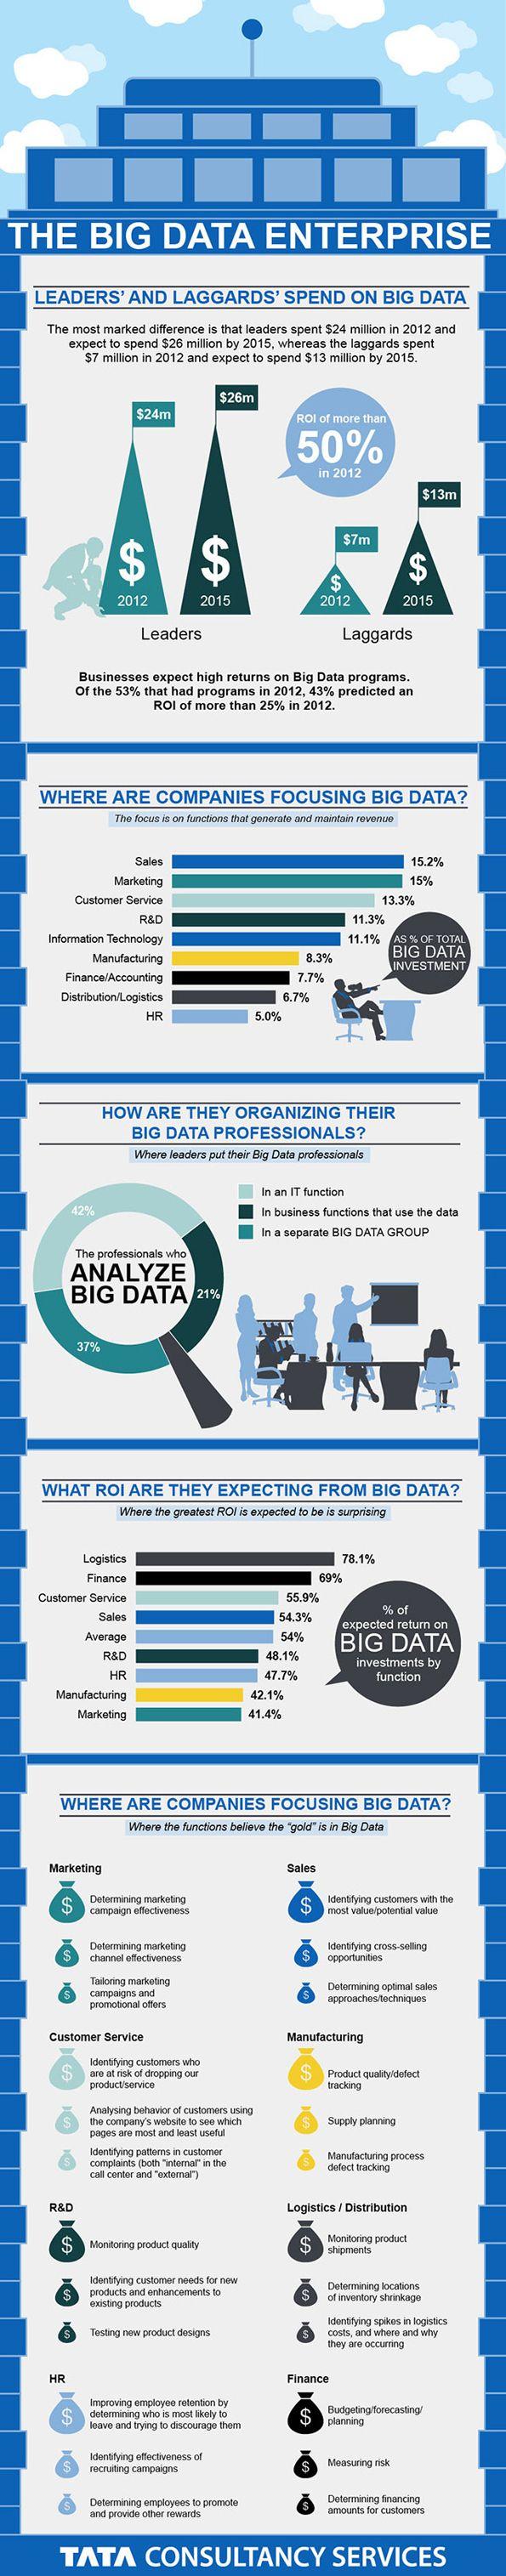 The Big Data Enterprise on www.business-on-line.fr